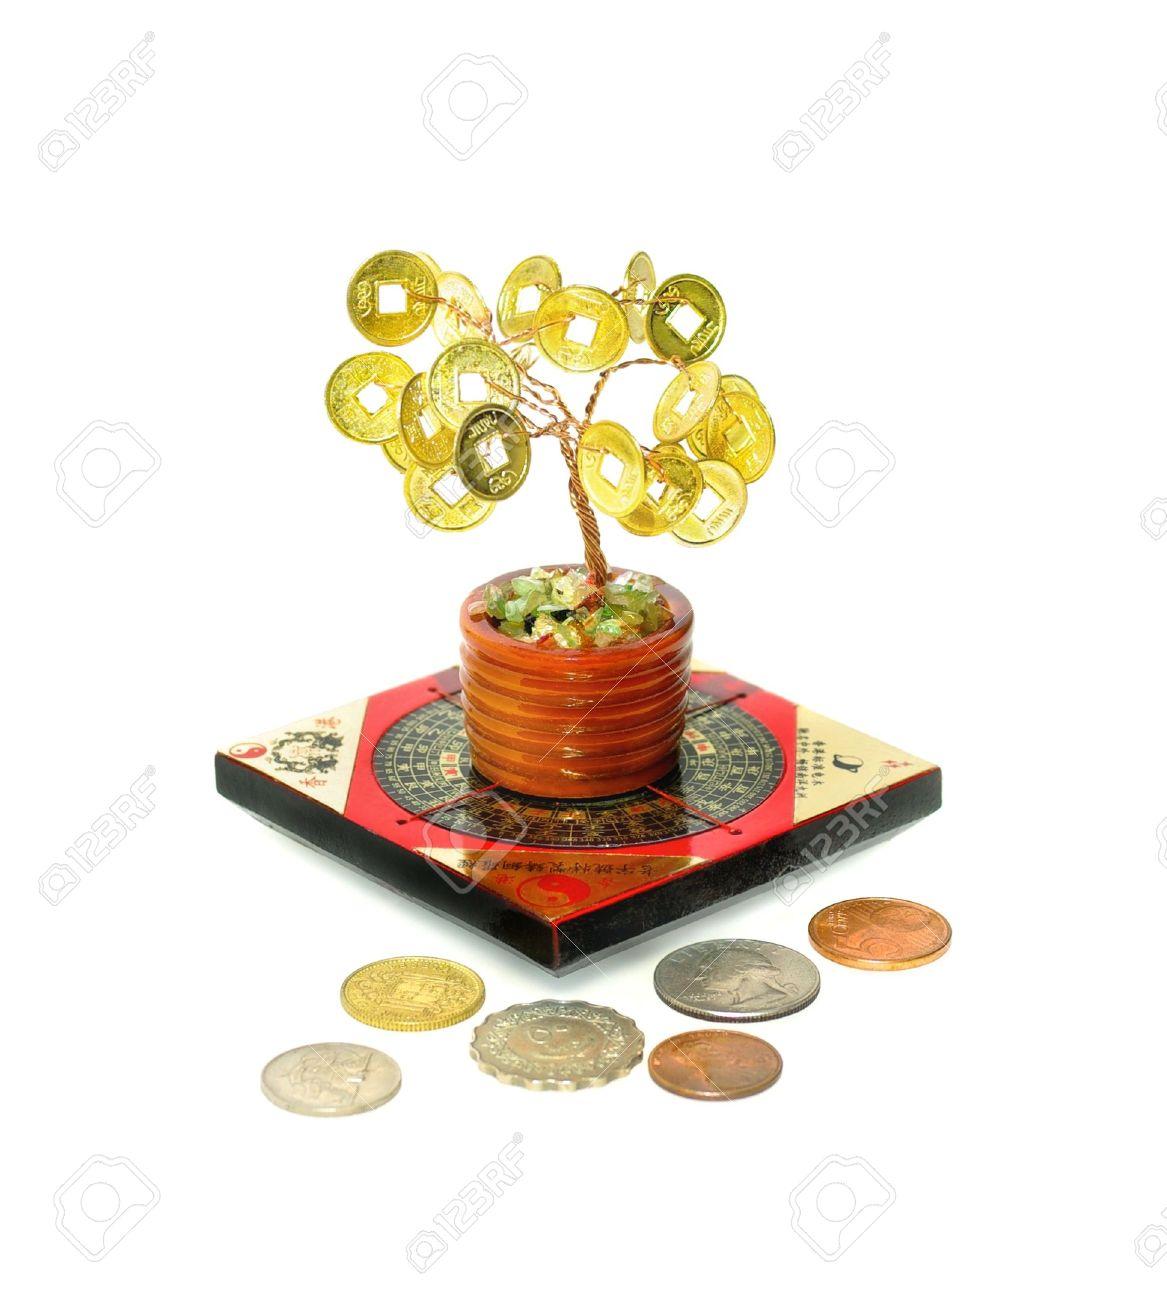 Chinese Money Tree Symbol Of Wealth Growth Symbols Of Wealth